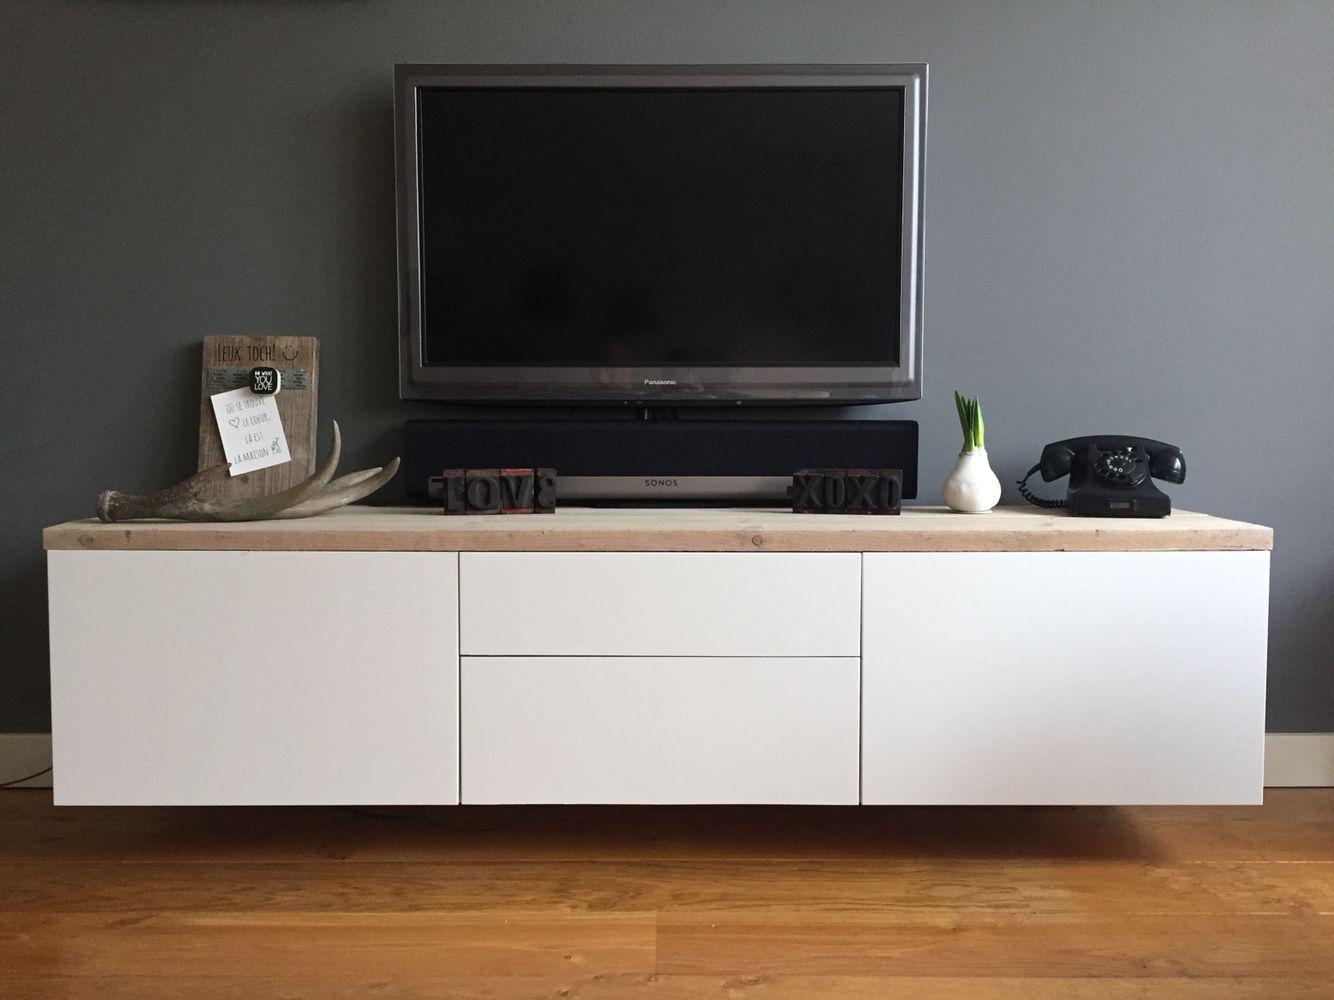 Ikea Besta met steigerhout  muebles tv en 2019  Muebles